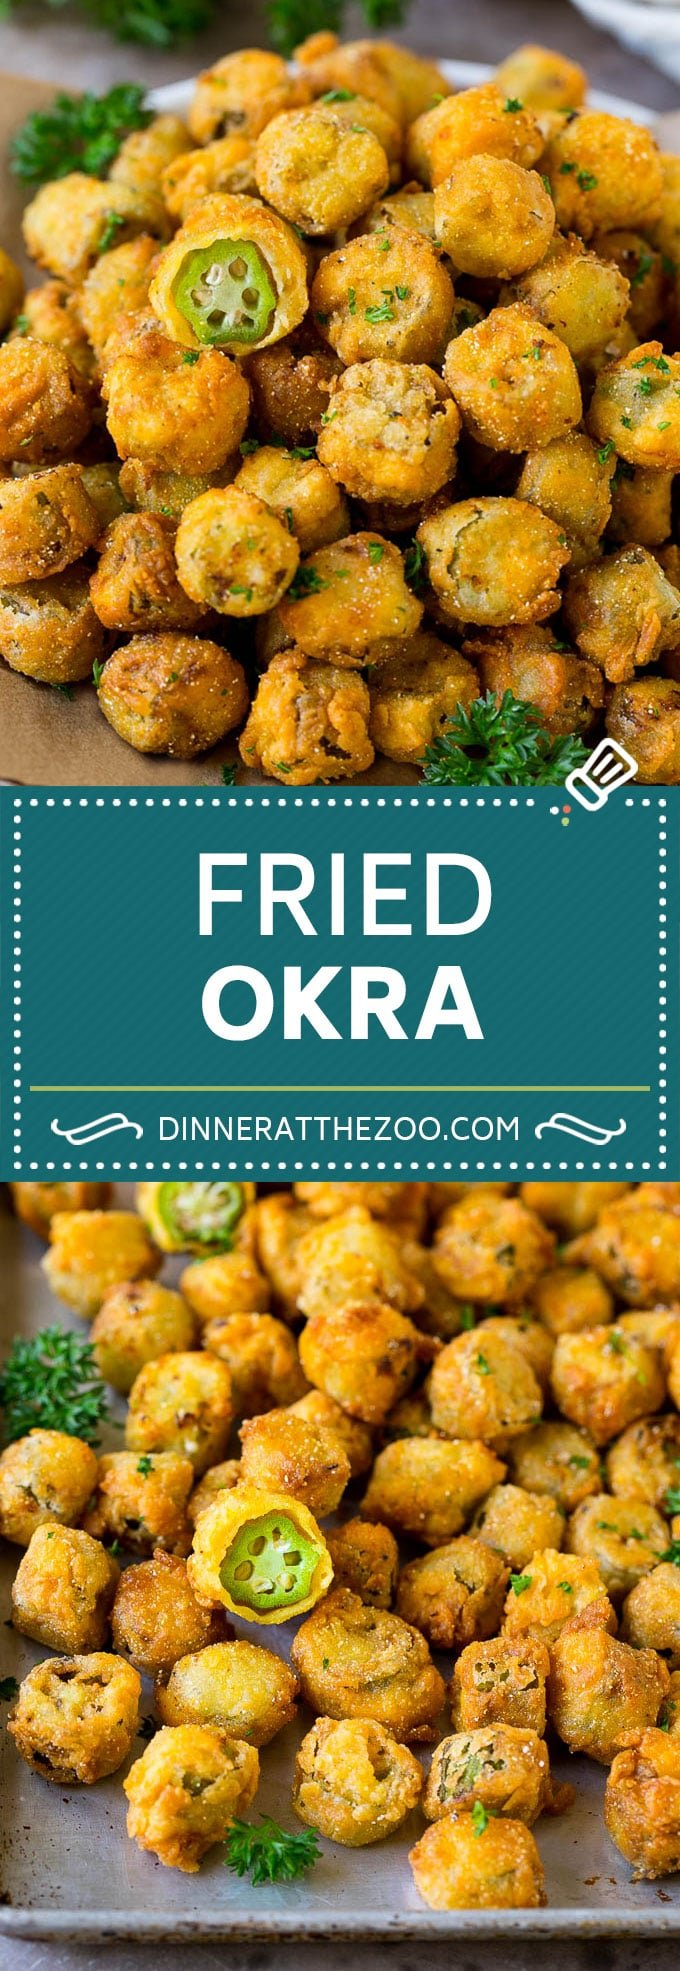 Fried Okra Recipe #okra #appetizer #sidedish #dinneratthezoo